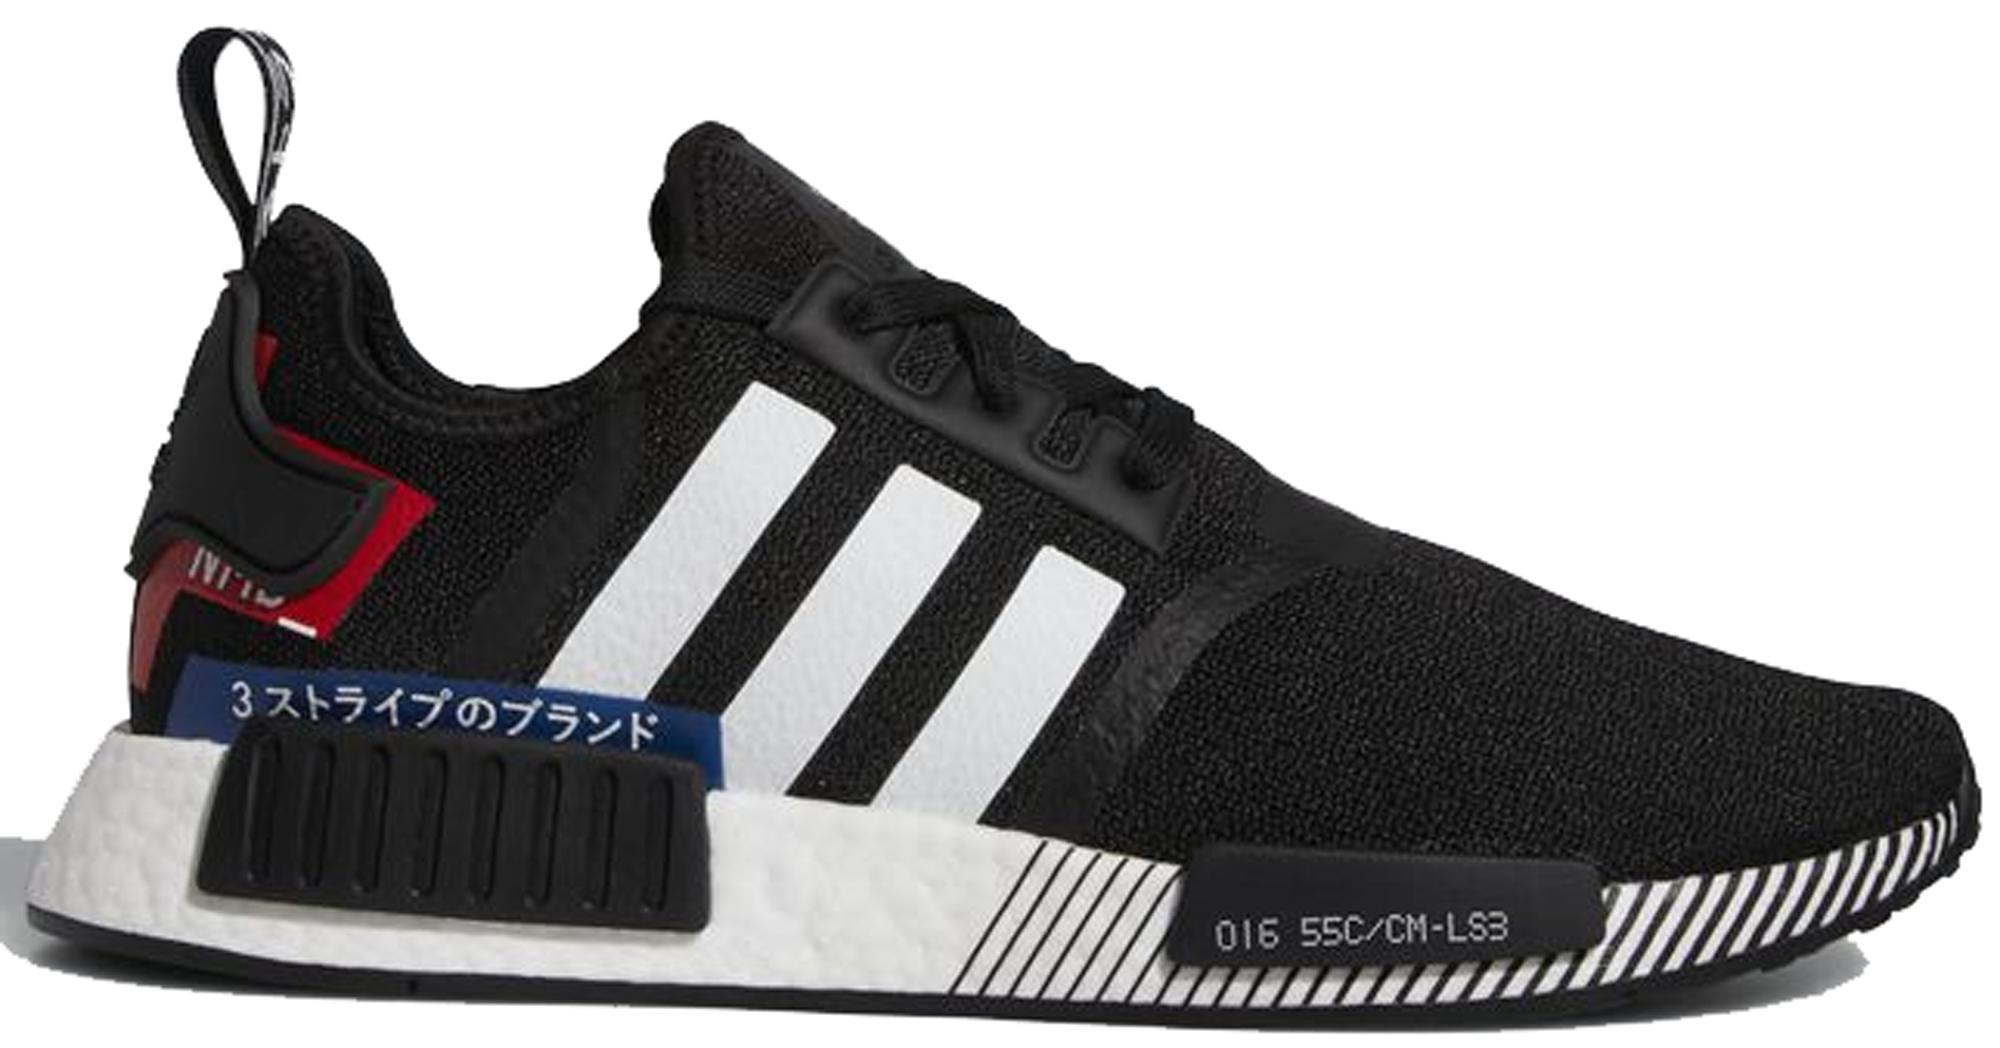 adidas NMD R1 Japan Pack Black (2019)